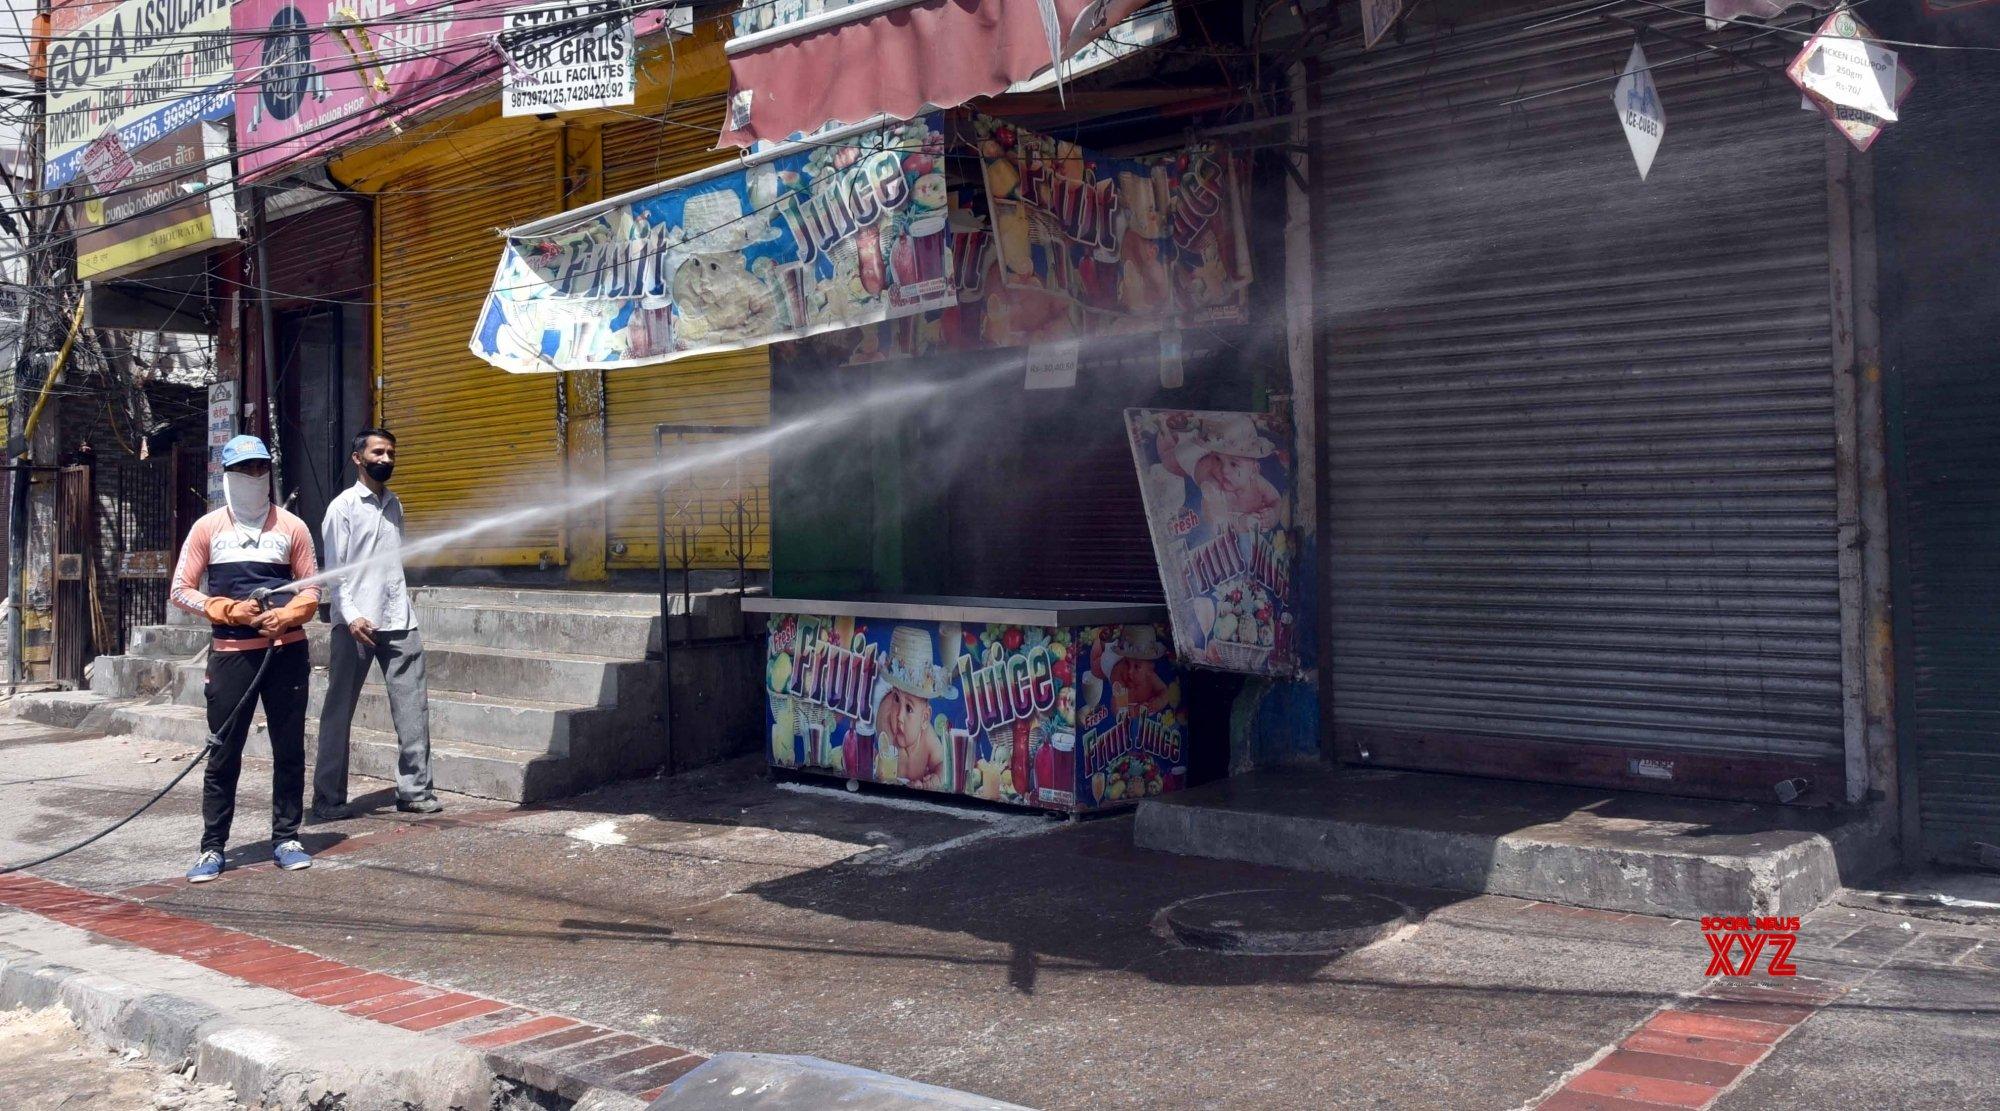 New Delhi: Sanitisation drive conducted at Delhi's Laxmi Nagar during lockdown #Gallery